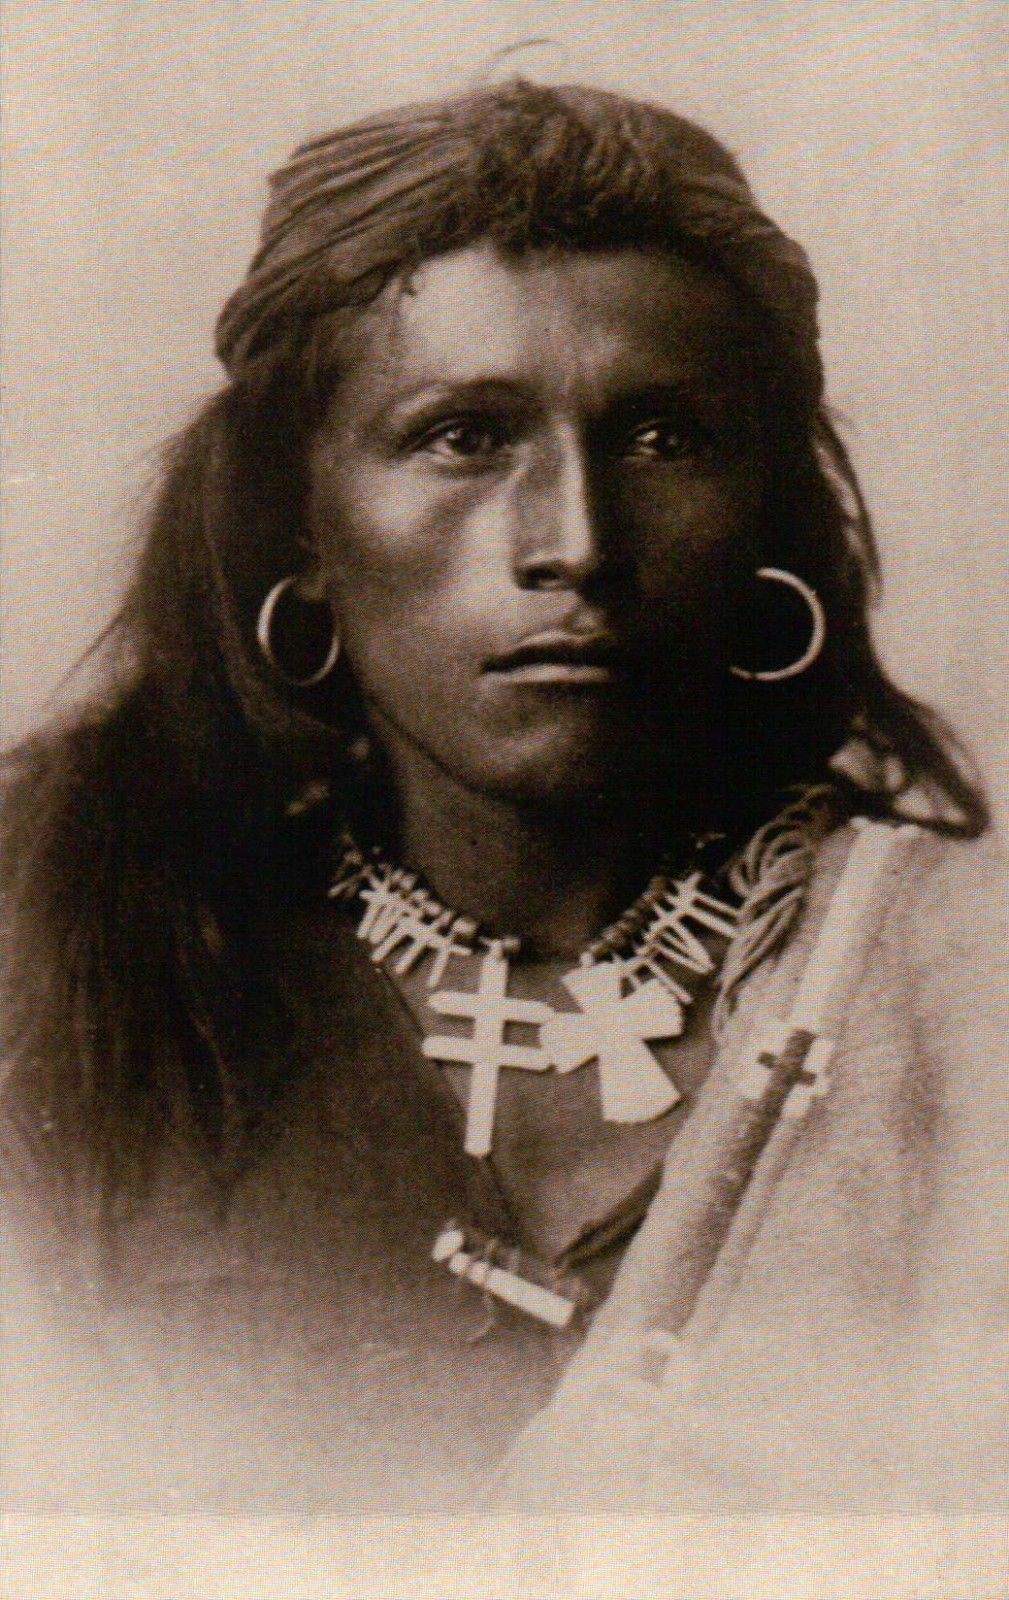 tom torlino navajo native american indian carlisle